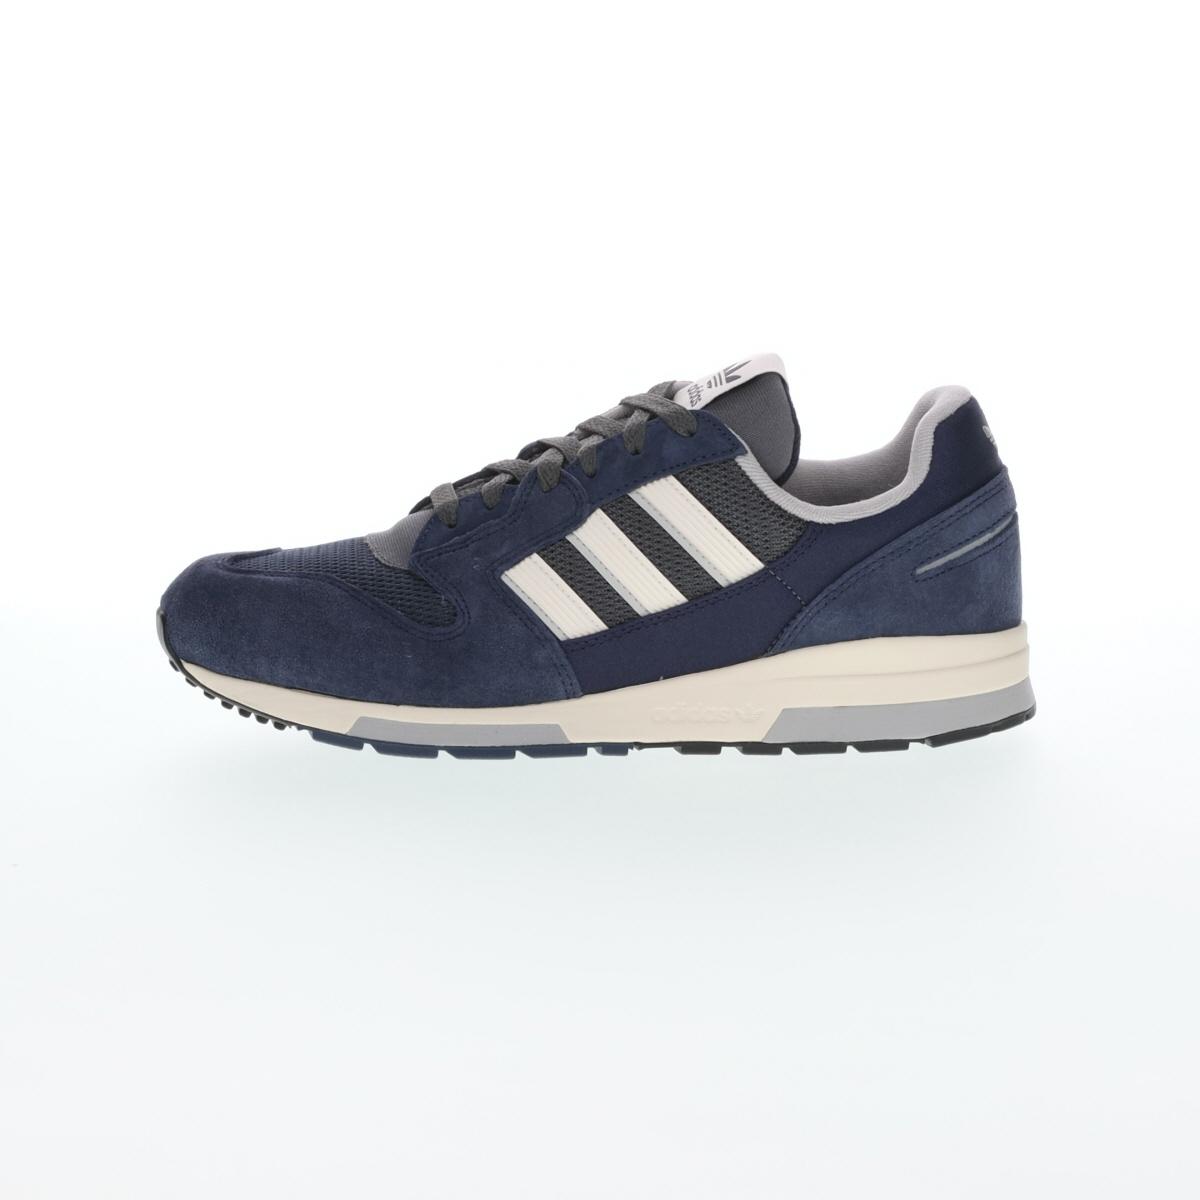 nike free cross training shoes women clothes